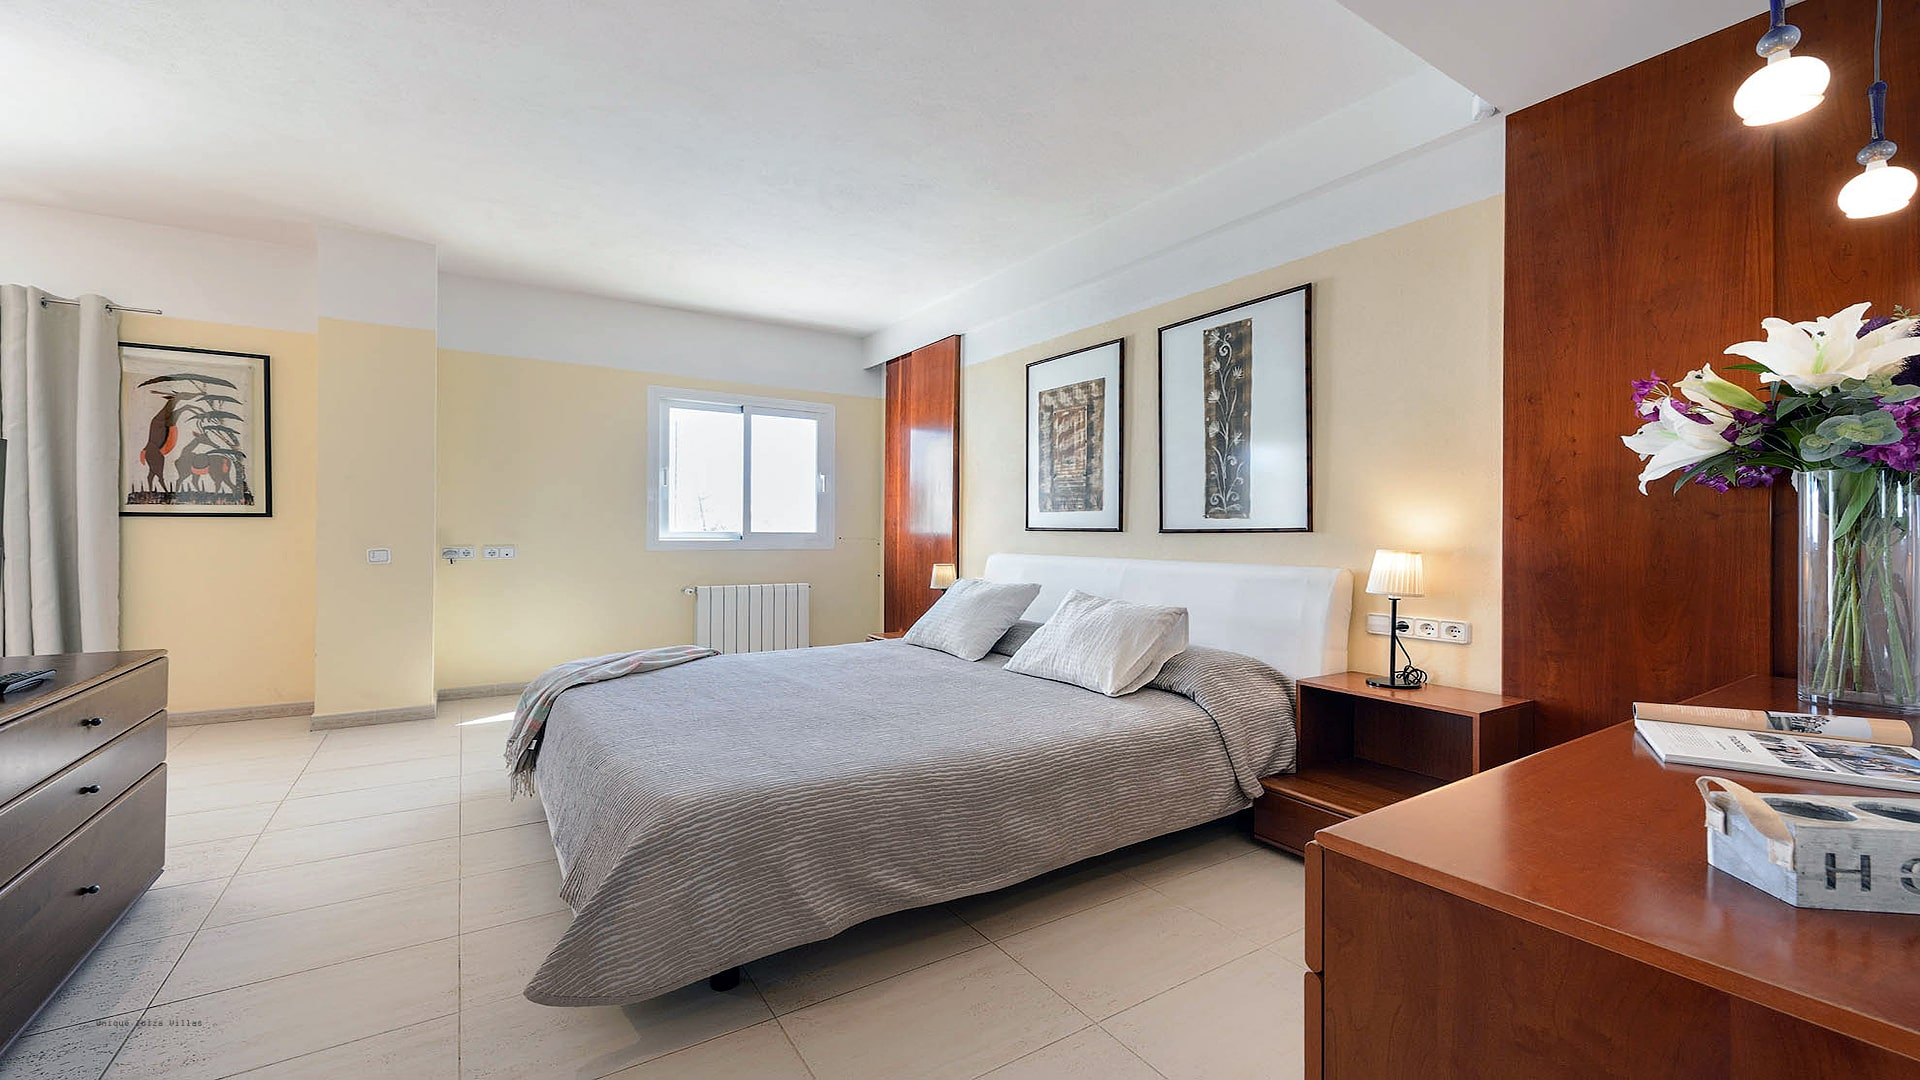 Villa Can Fluxa Ibiza 31 Bedroom 1